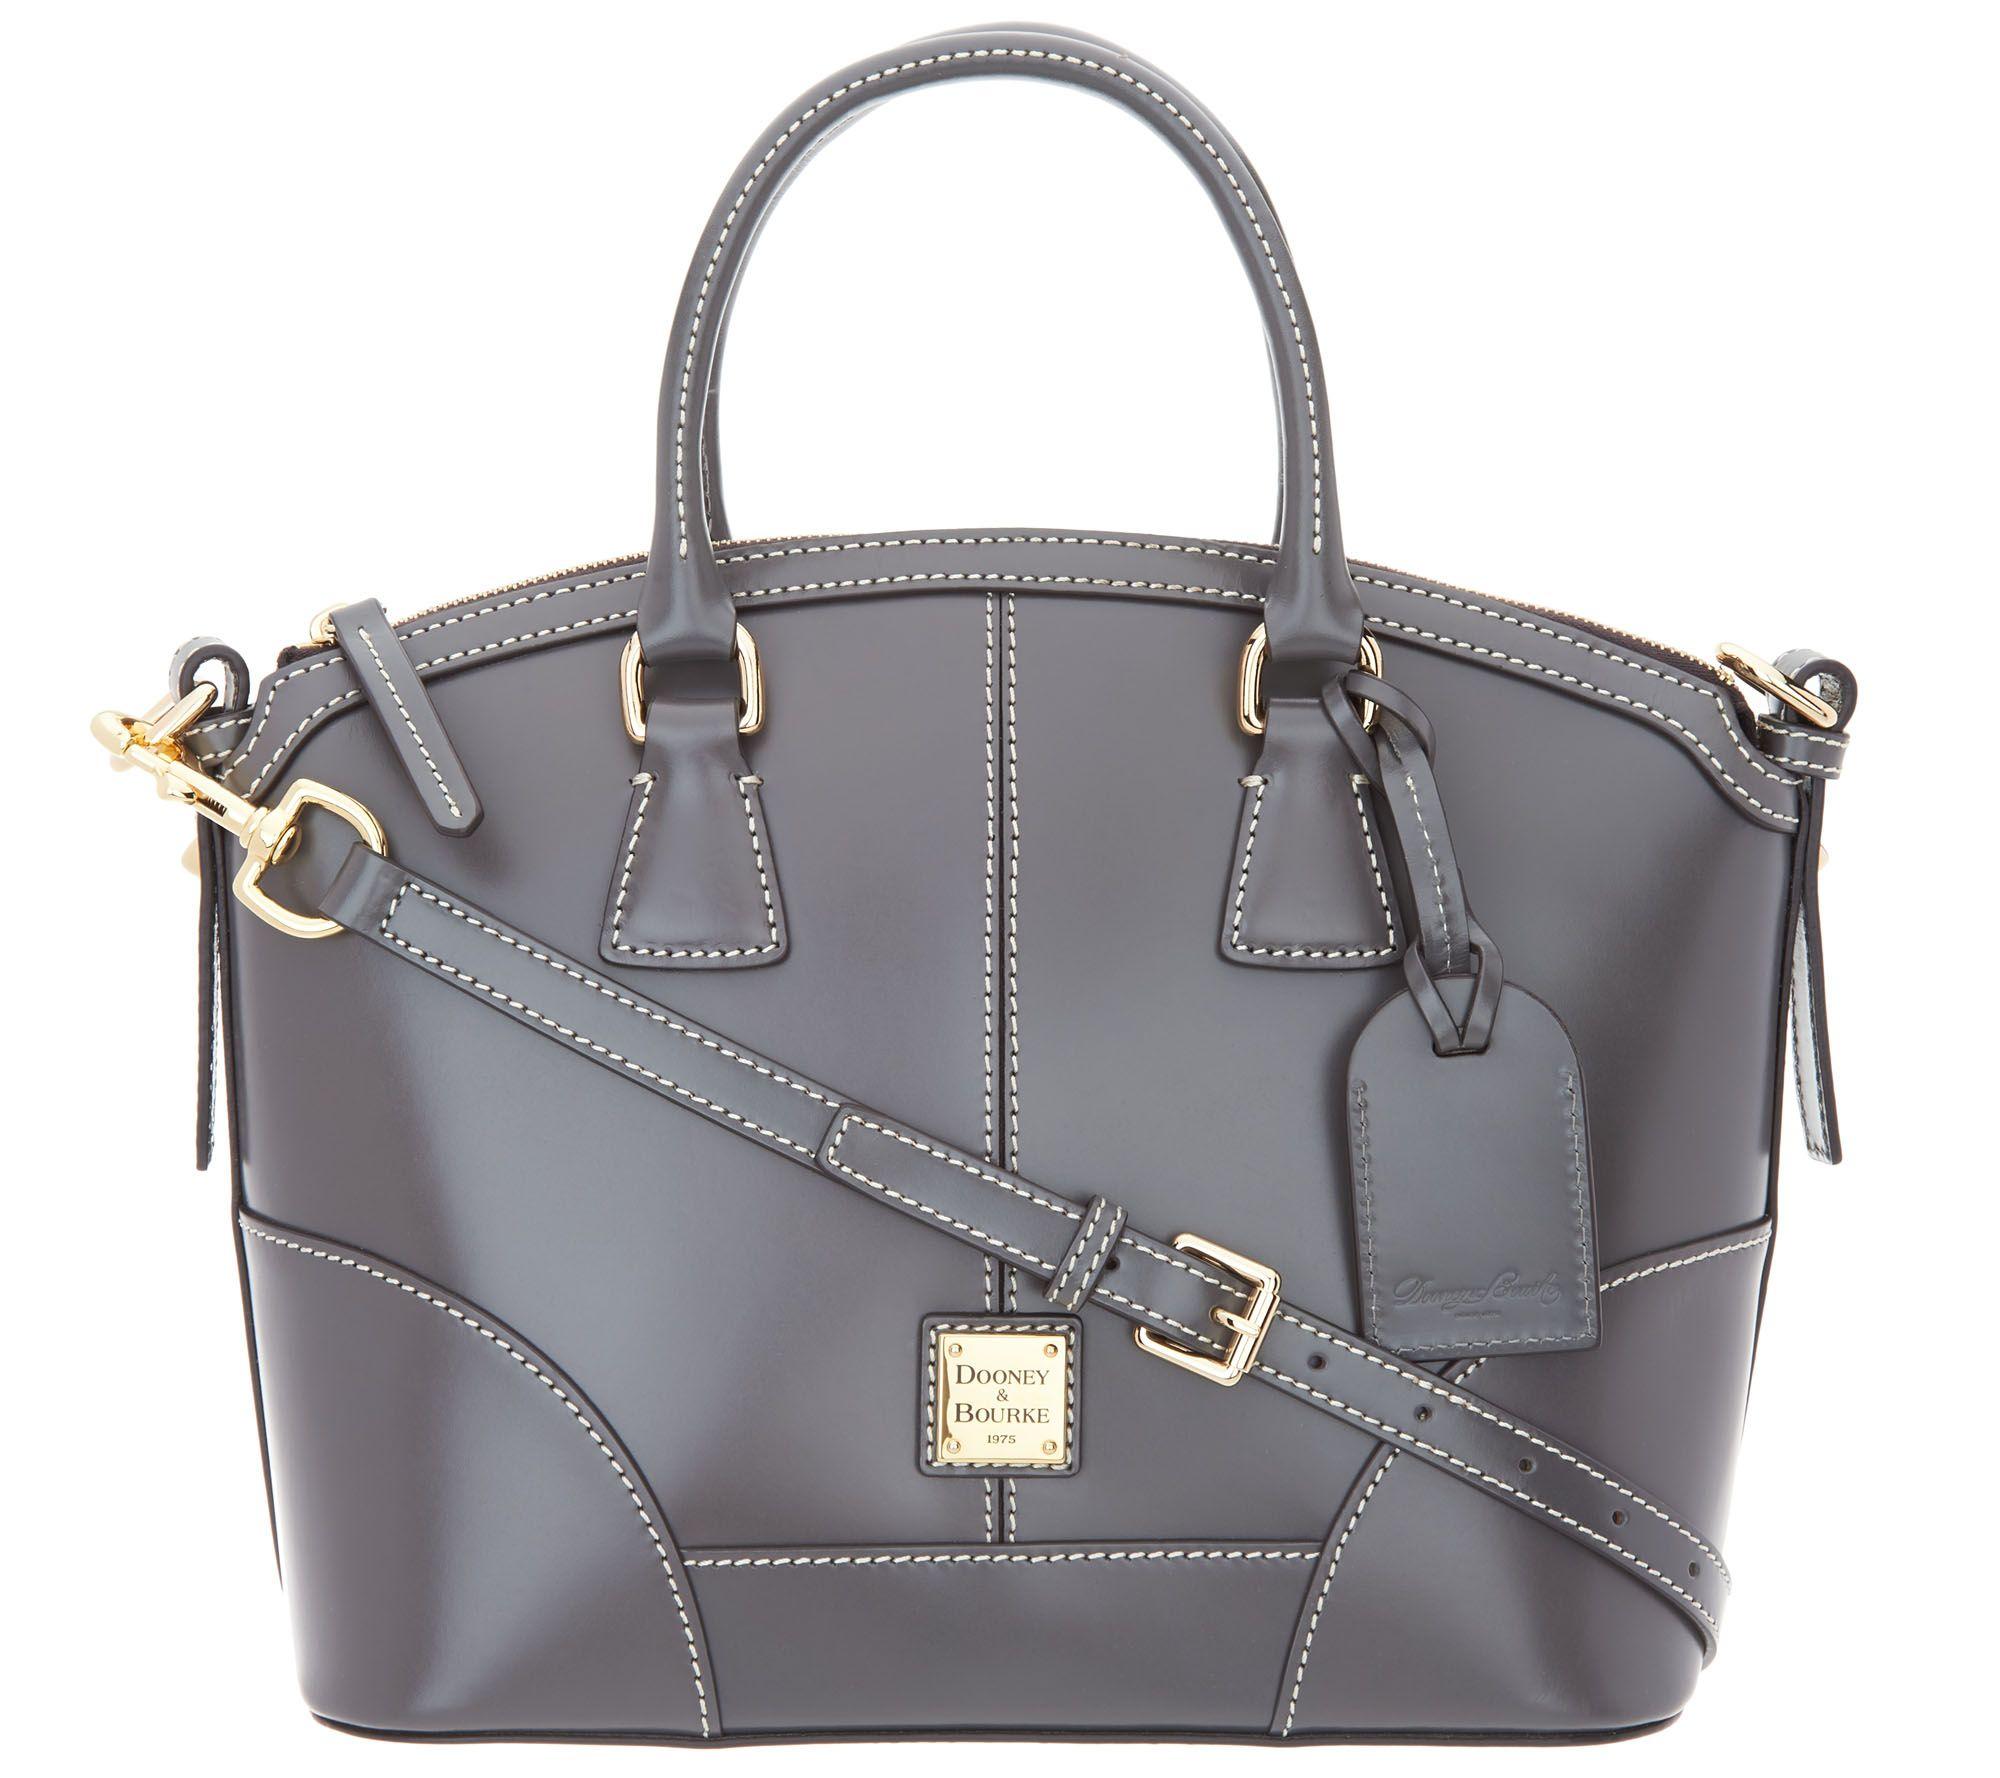 122ec1dee499 Dooney & Bourke Selleria Florentine Leather Domed Satchel — QVC.com